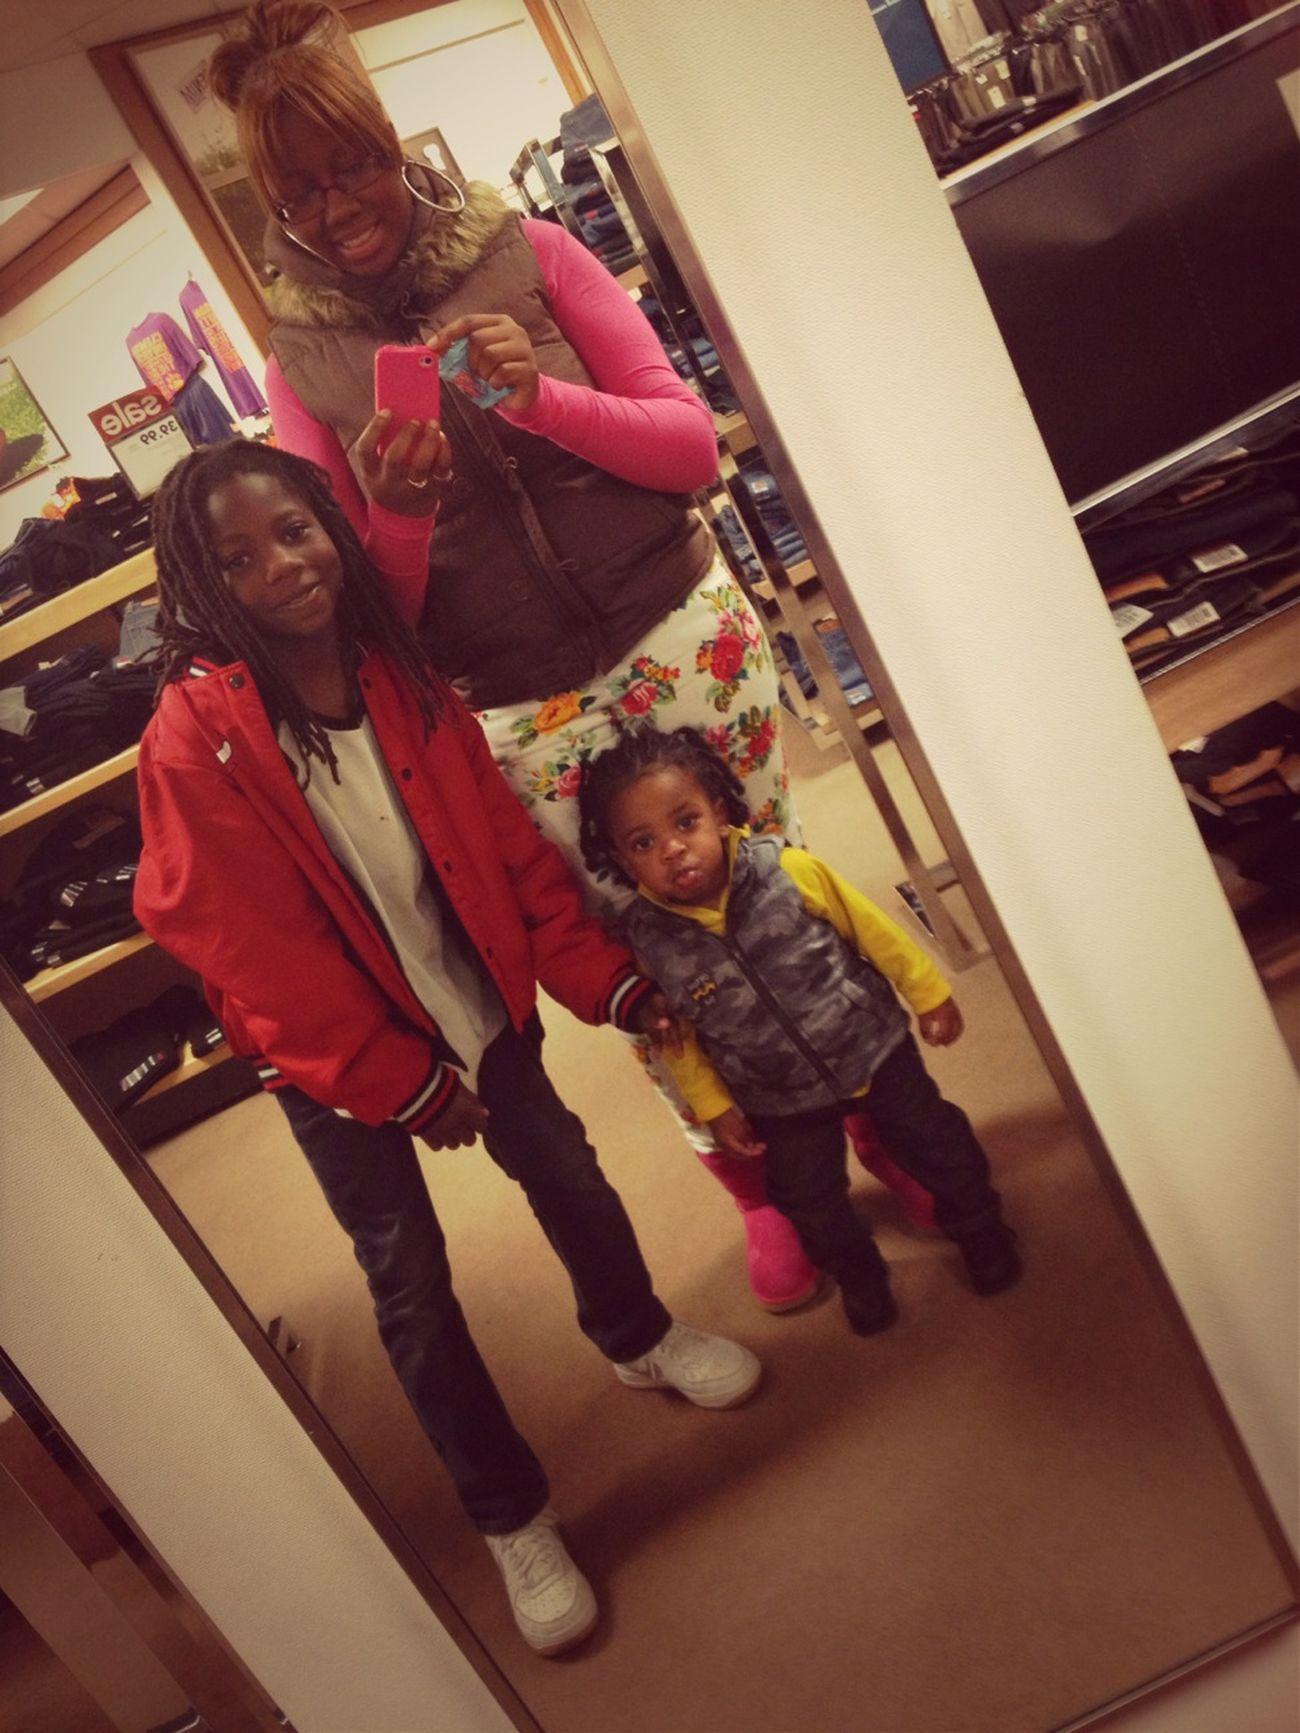 Me And My Nephews Yesterday